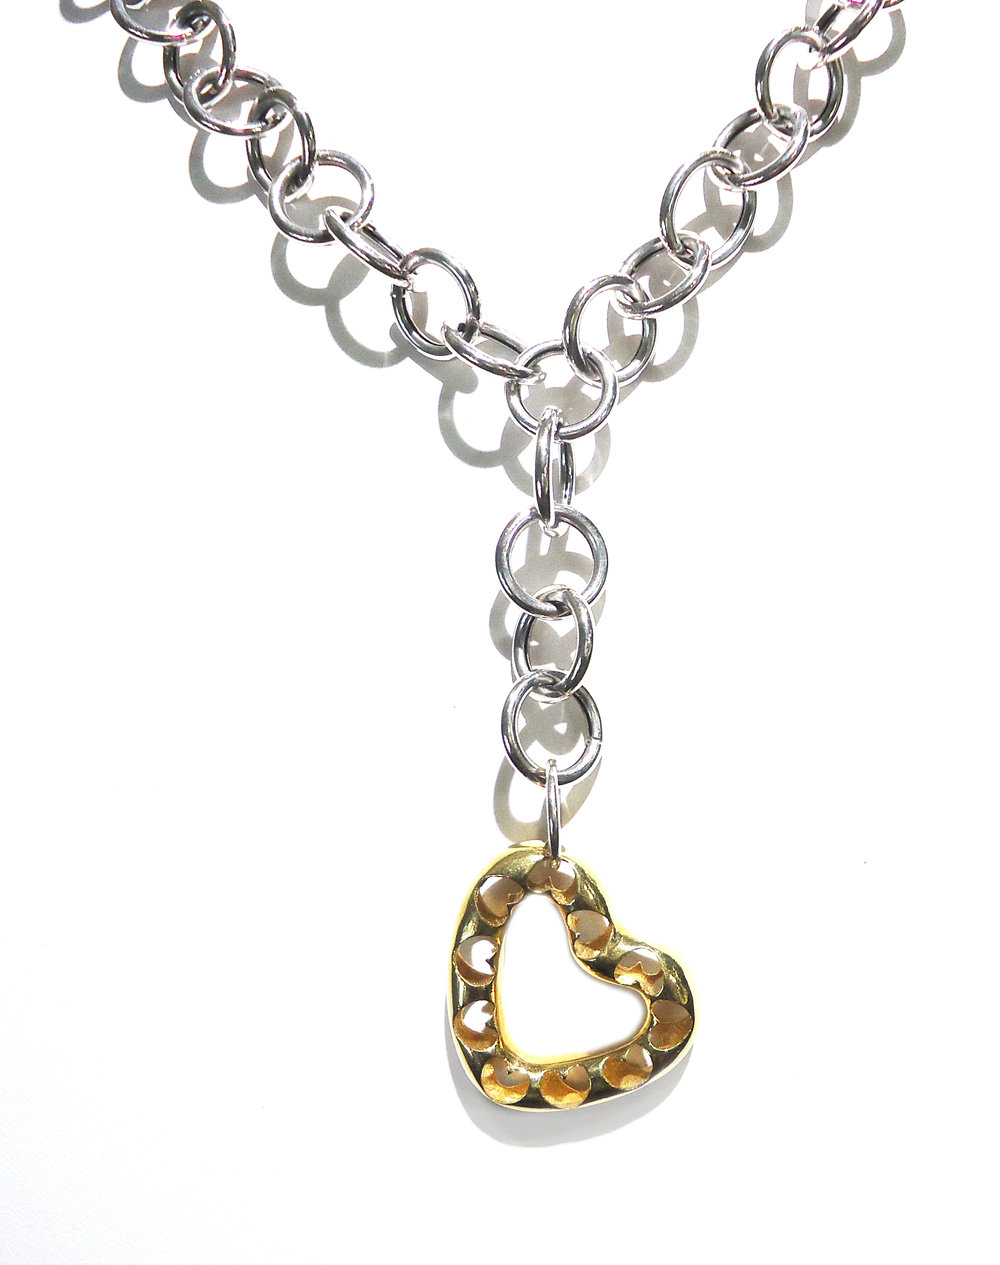 Hollow heart pendant!